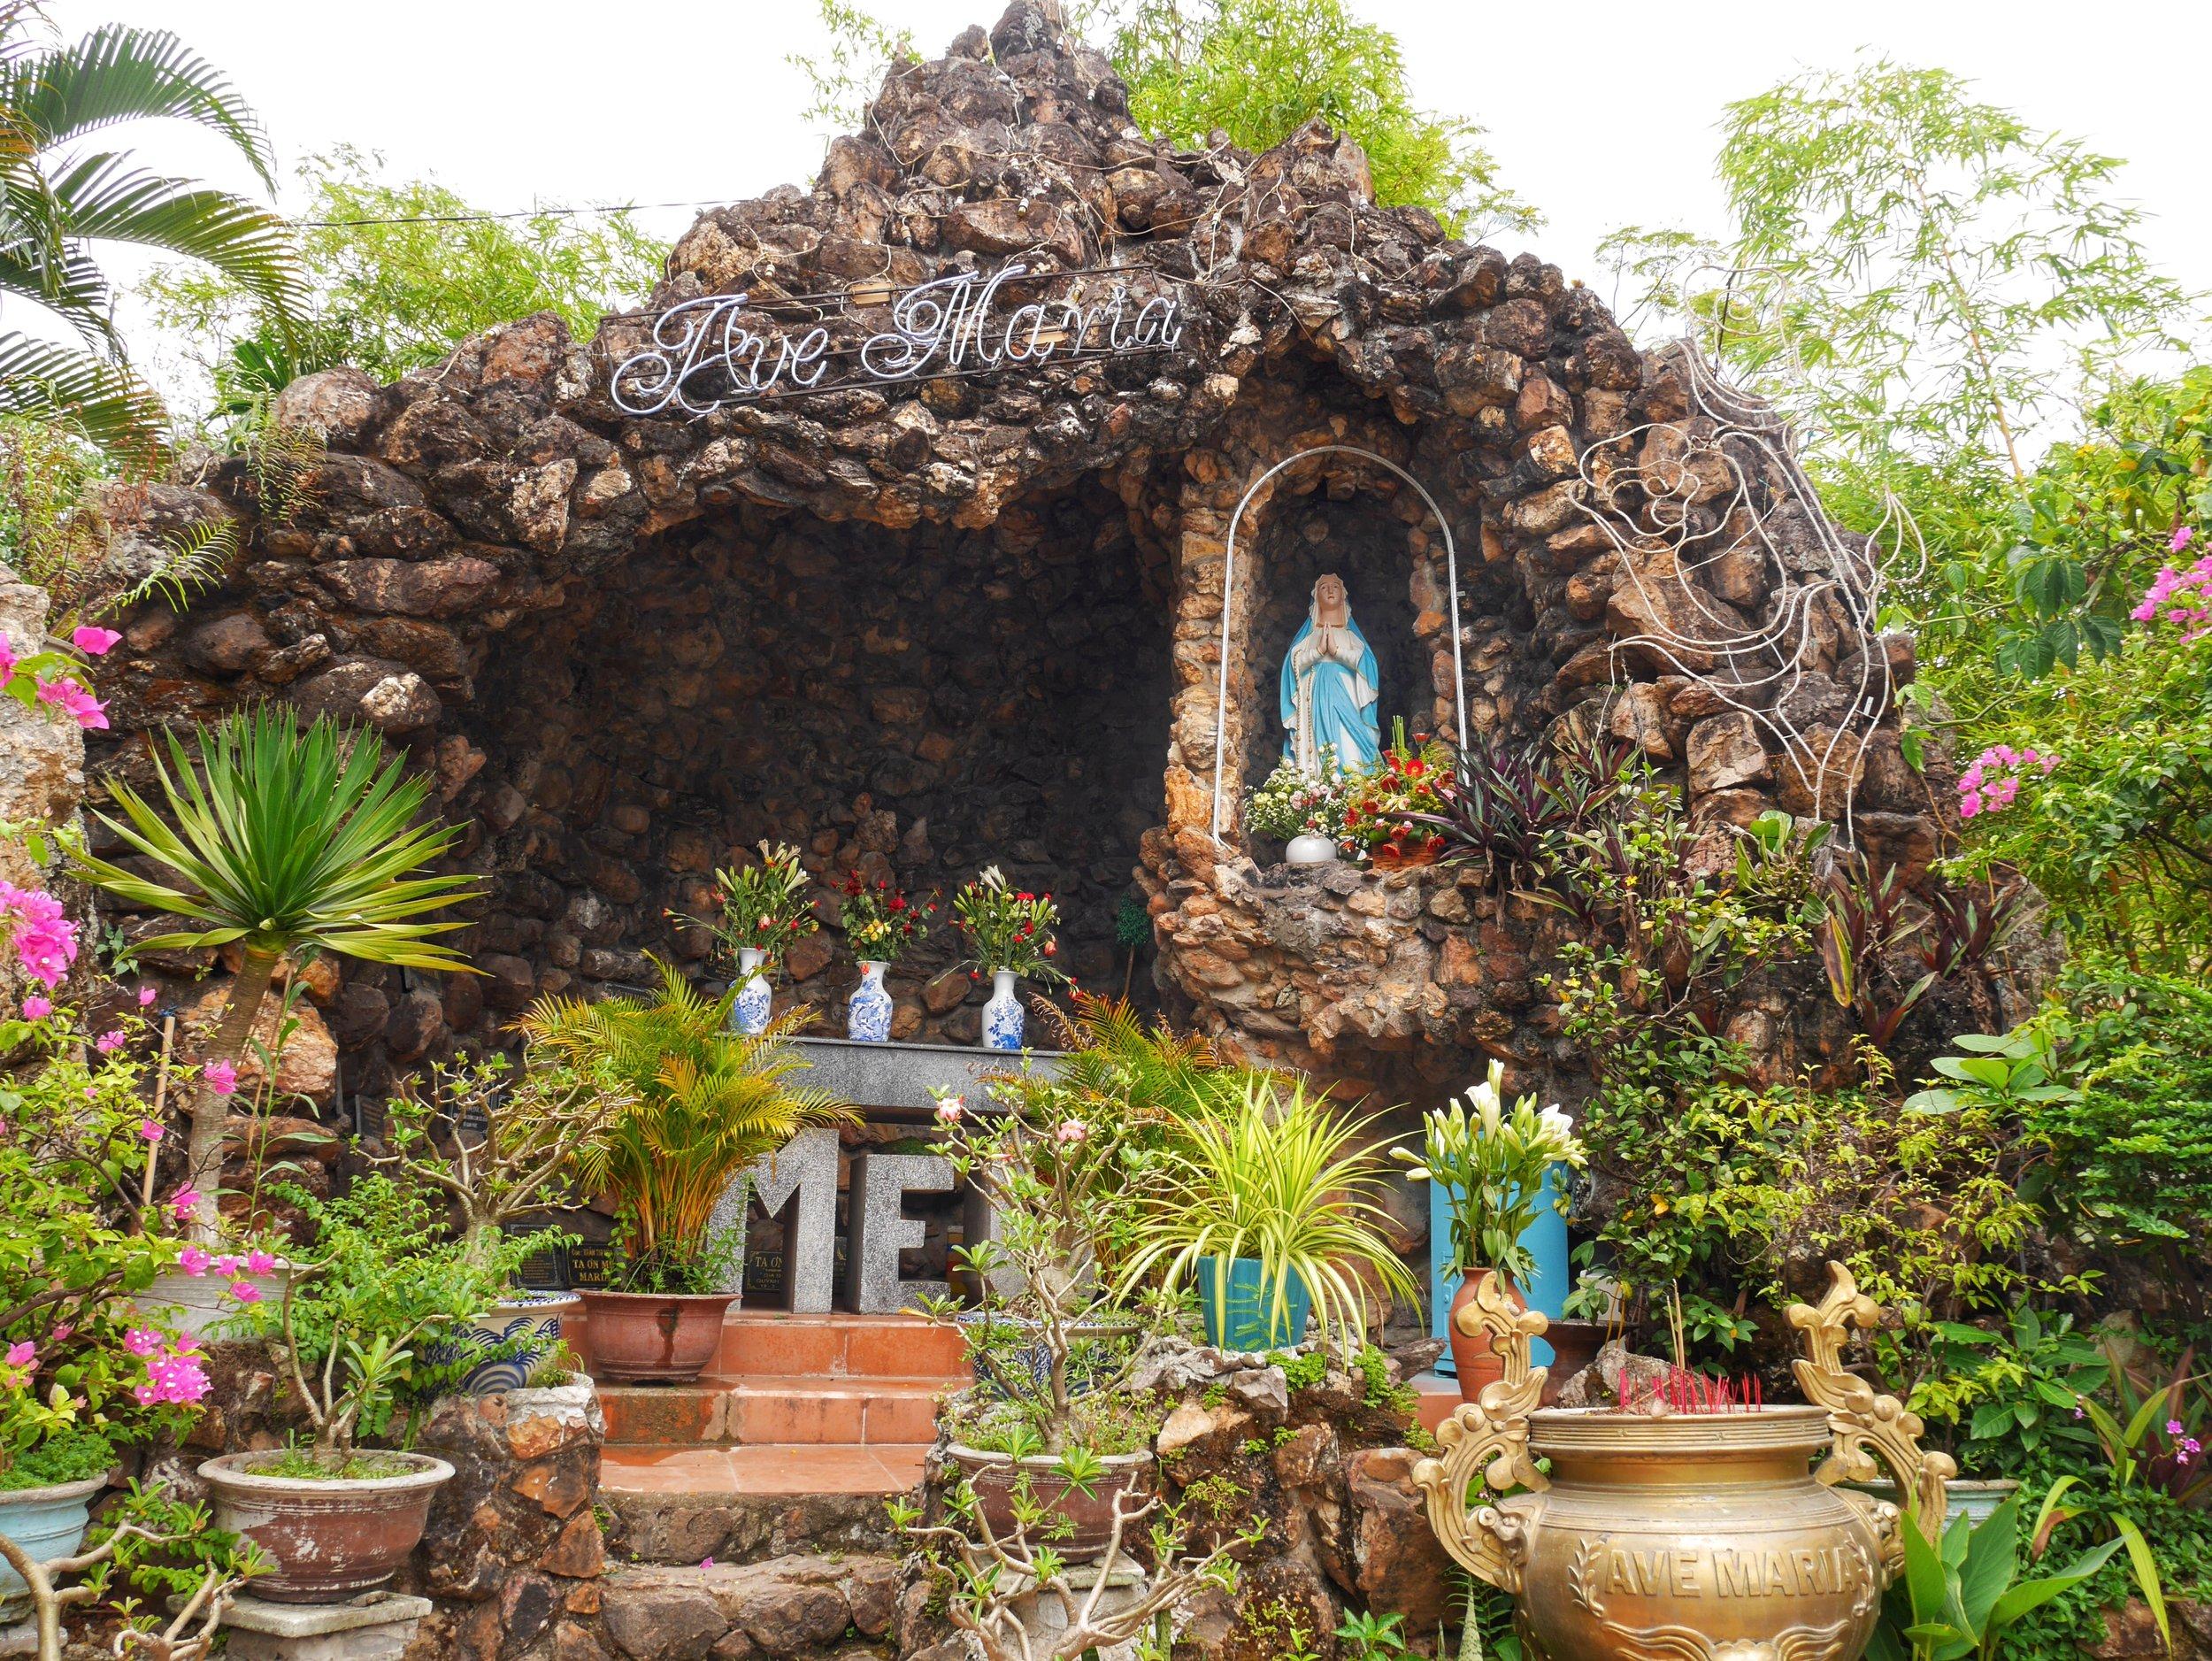 roman catholic grotto at Hue, Vietnam Cathedral